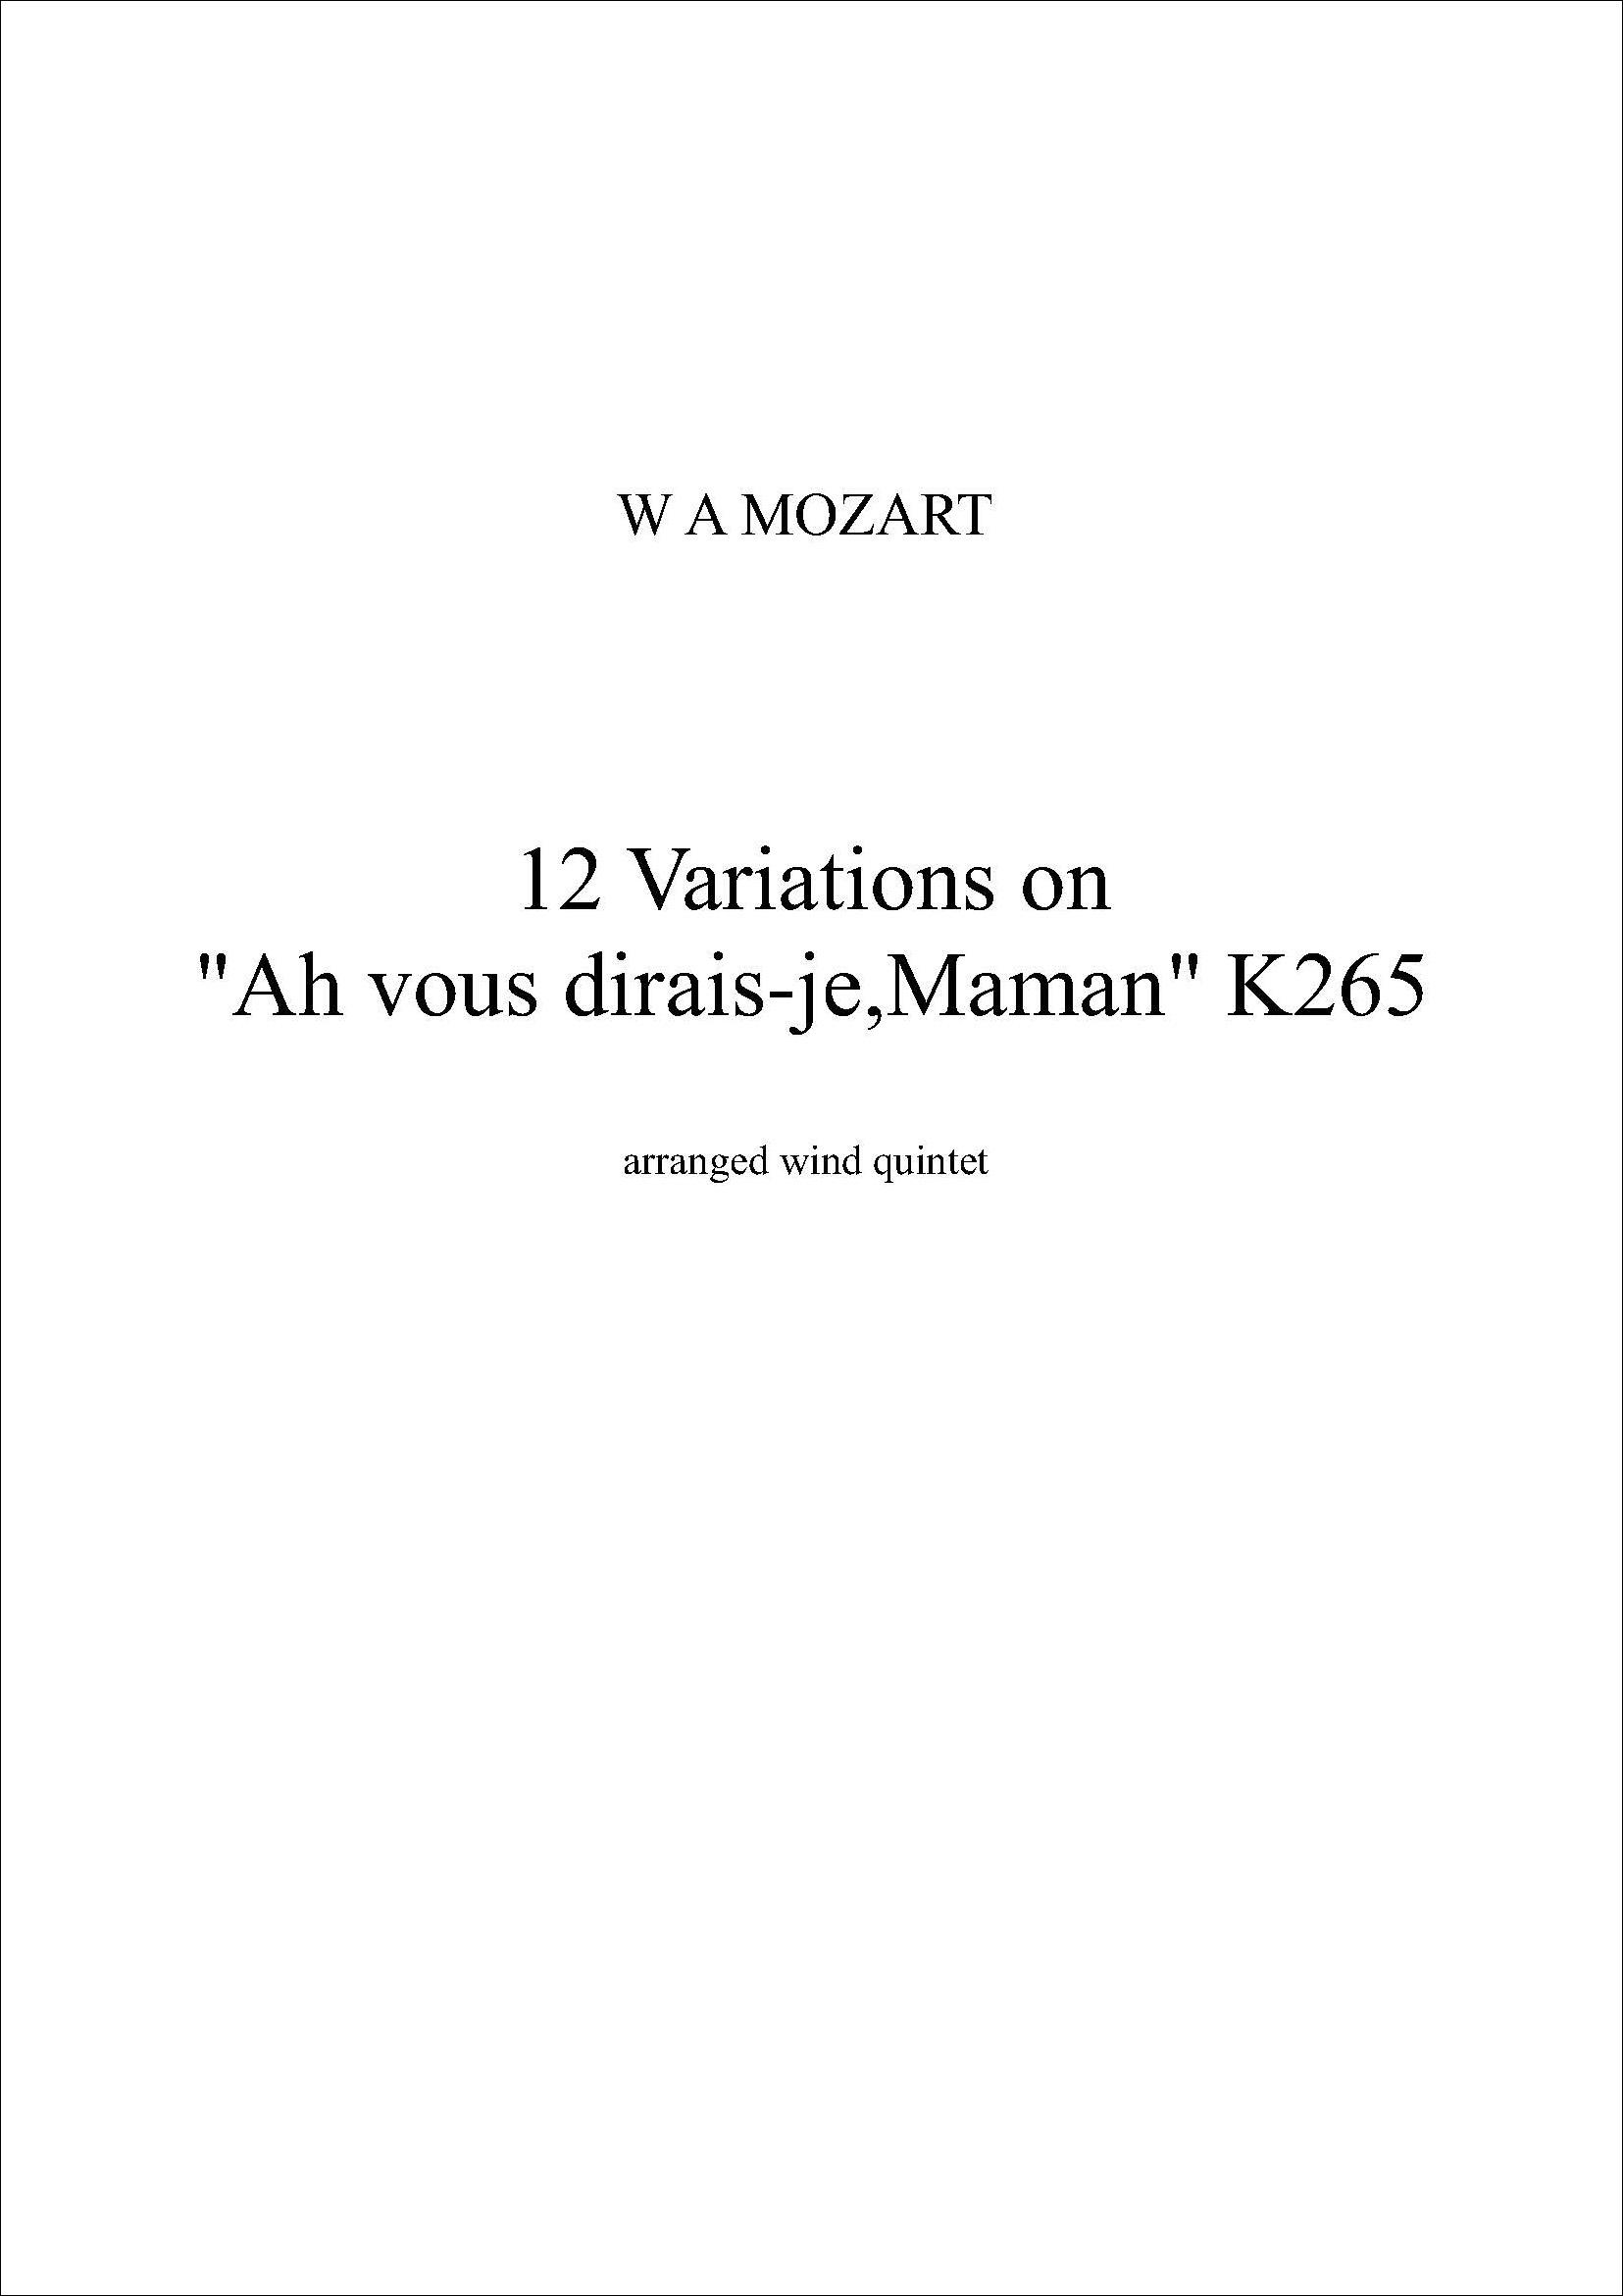 12 Variations on